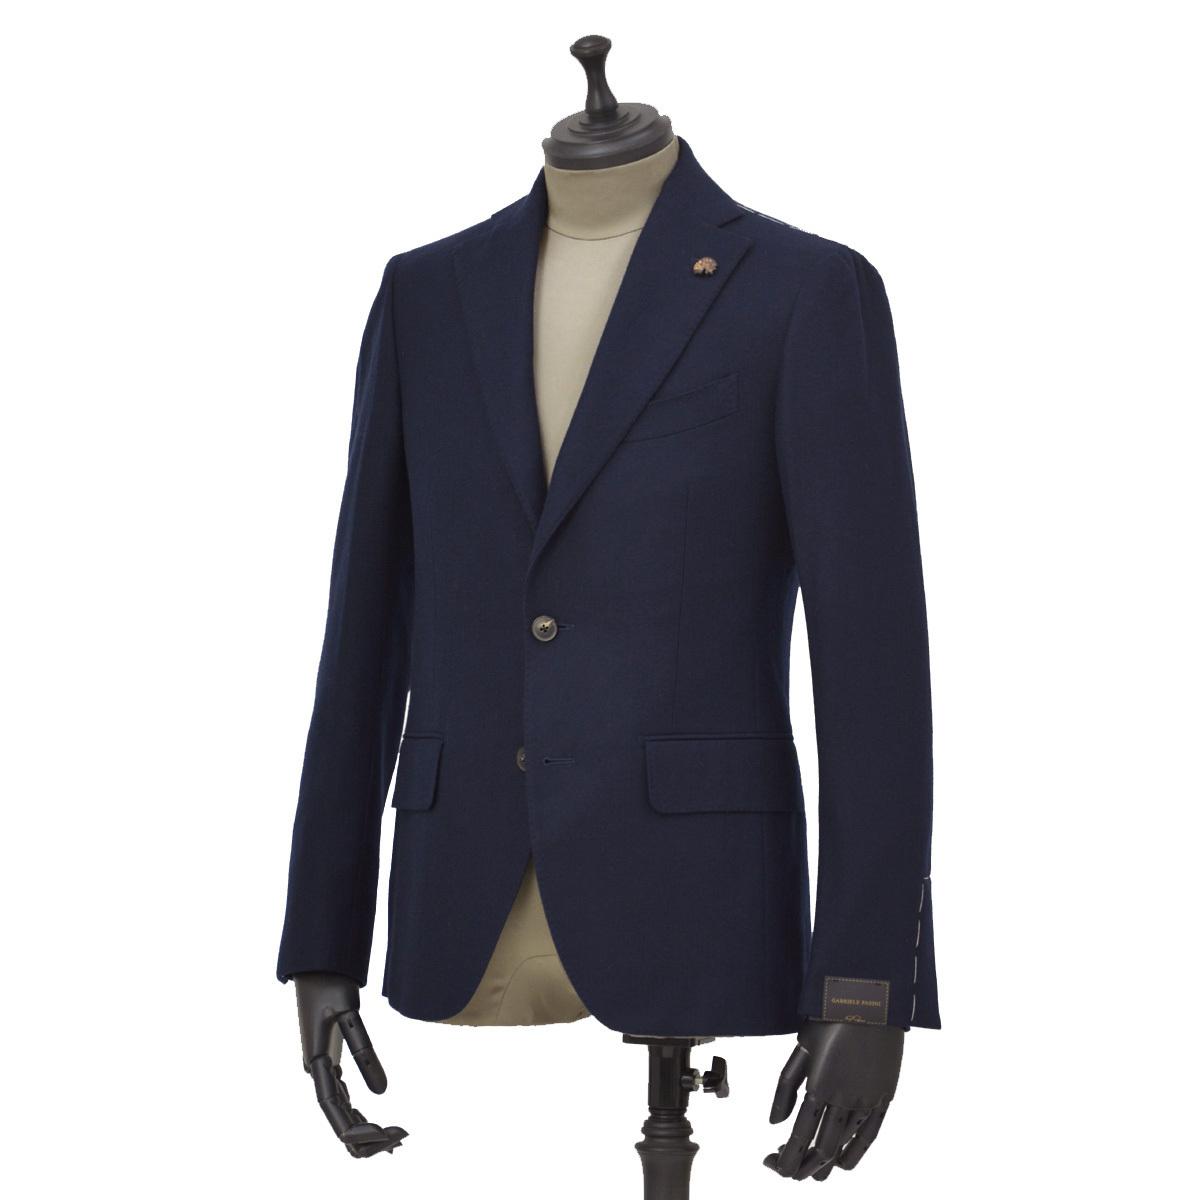 Gabriele Pasini【ガブリエレ パジーニ】シングルジャケット JG12066Q GPF12471 4 カシミア ネイビー